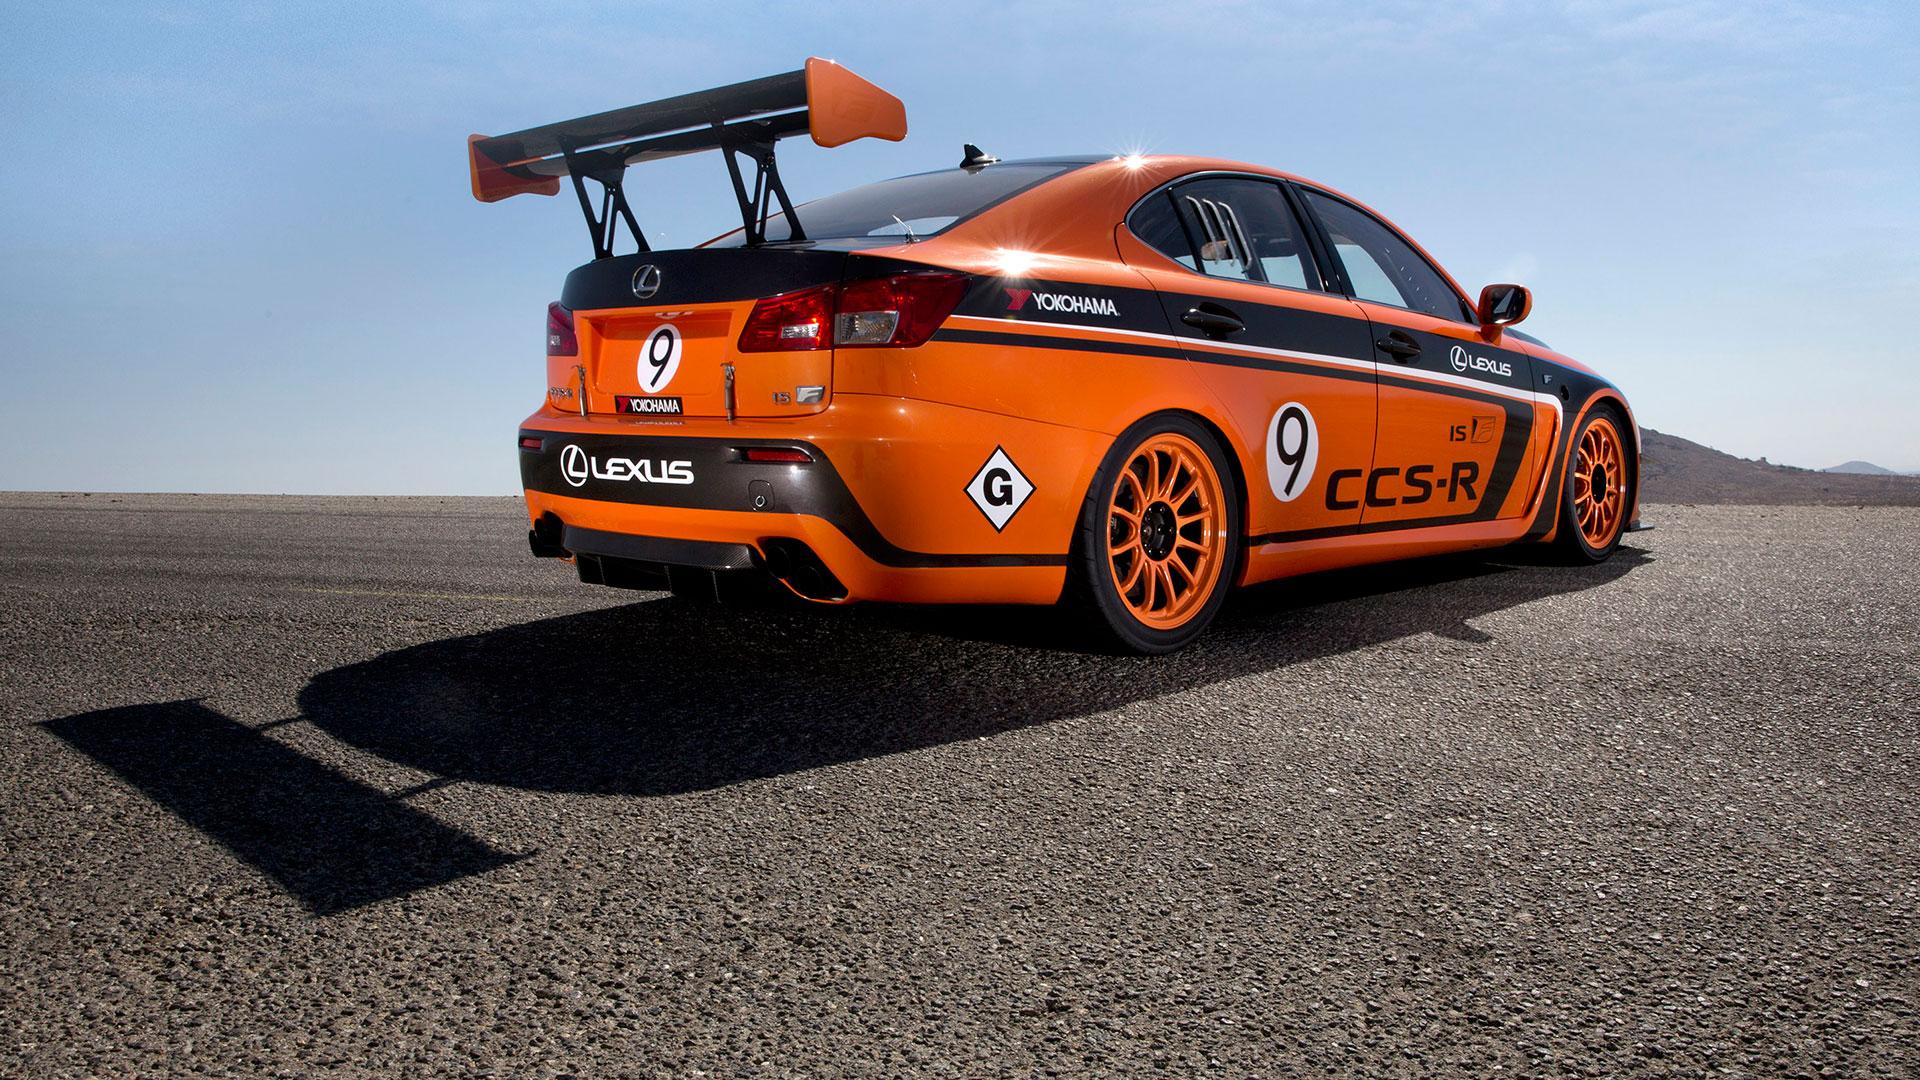 Lexus competirá subida a Pikes Peak hero asset